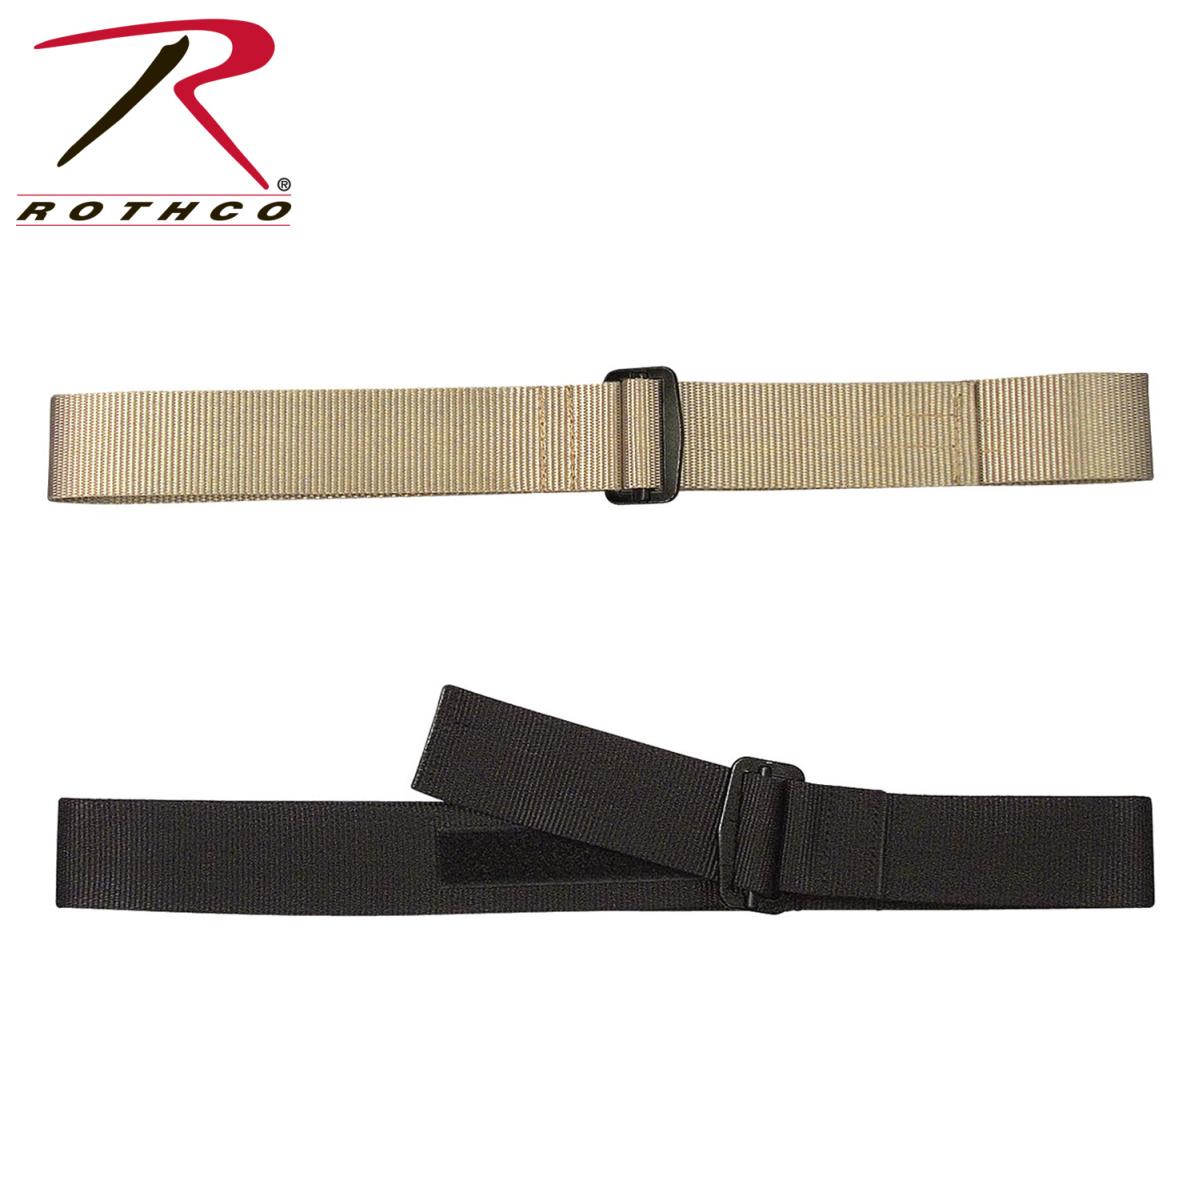 Bdu & Rigger Belt